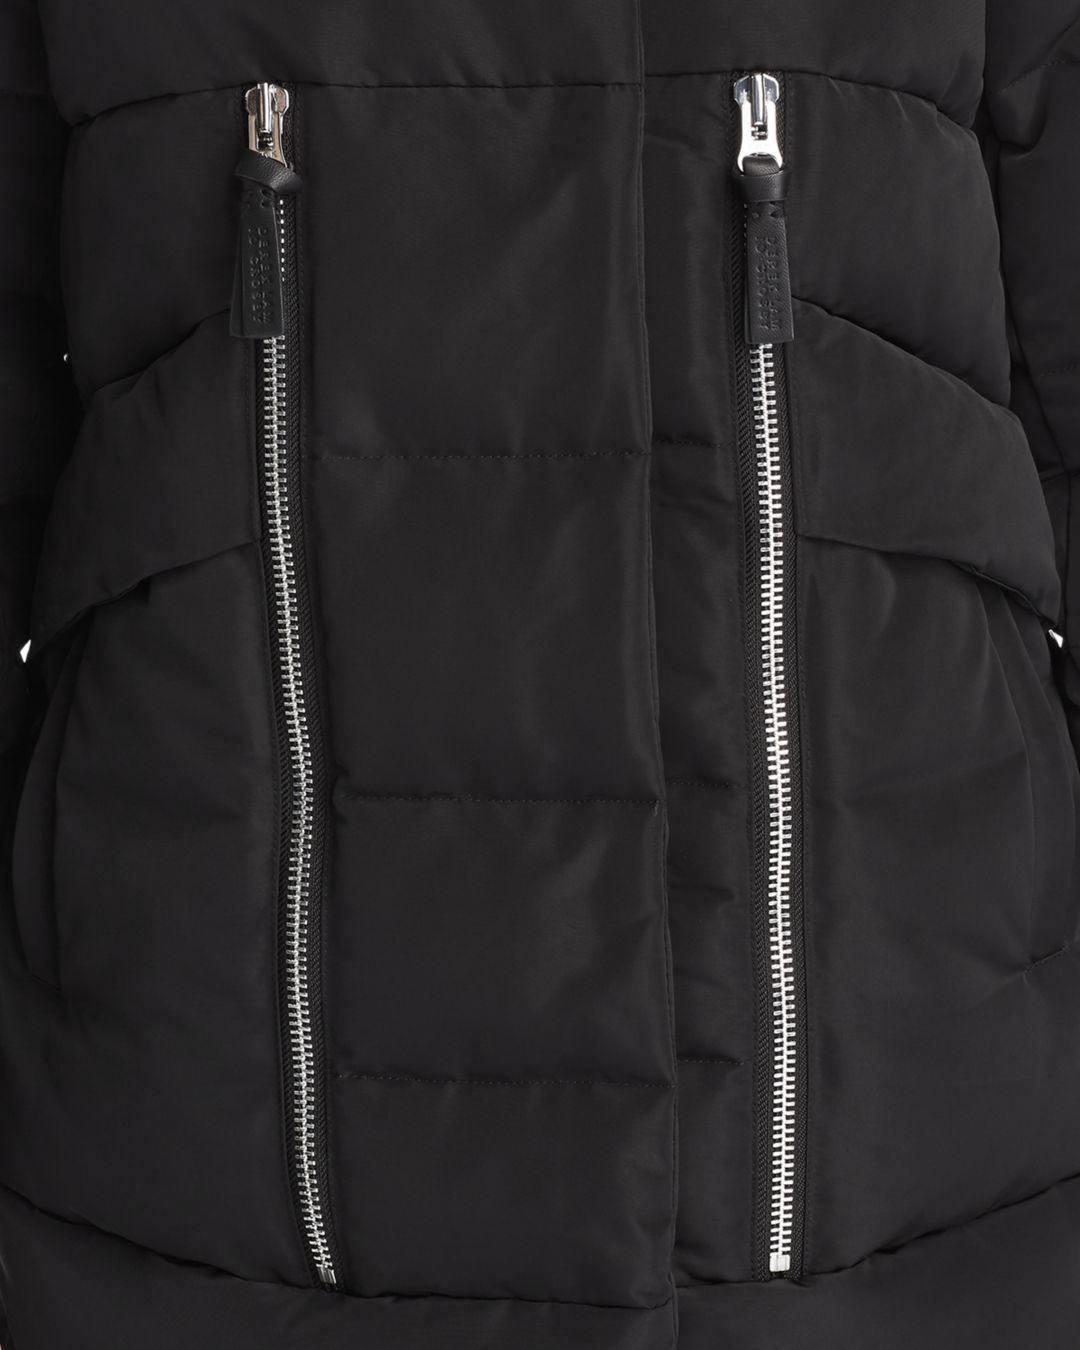 841d07bb7f4a 10 Crosby Derek Lam - Black Hooded Fox Fur Trim Mixed Media Down Coat -  Lyst. View fullscreen